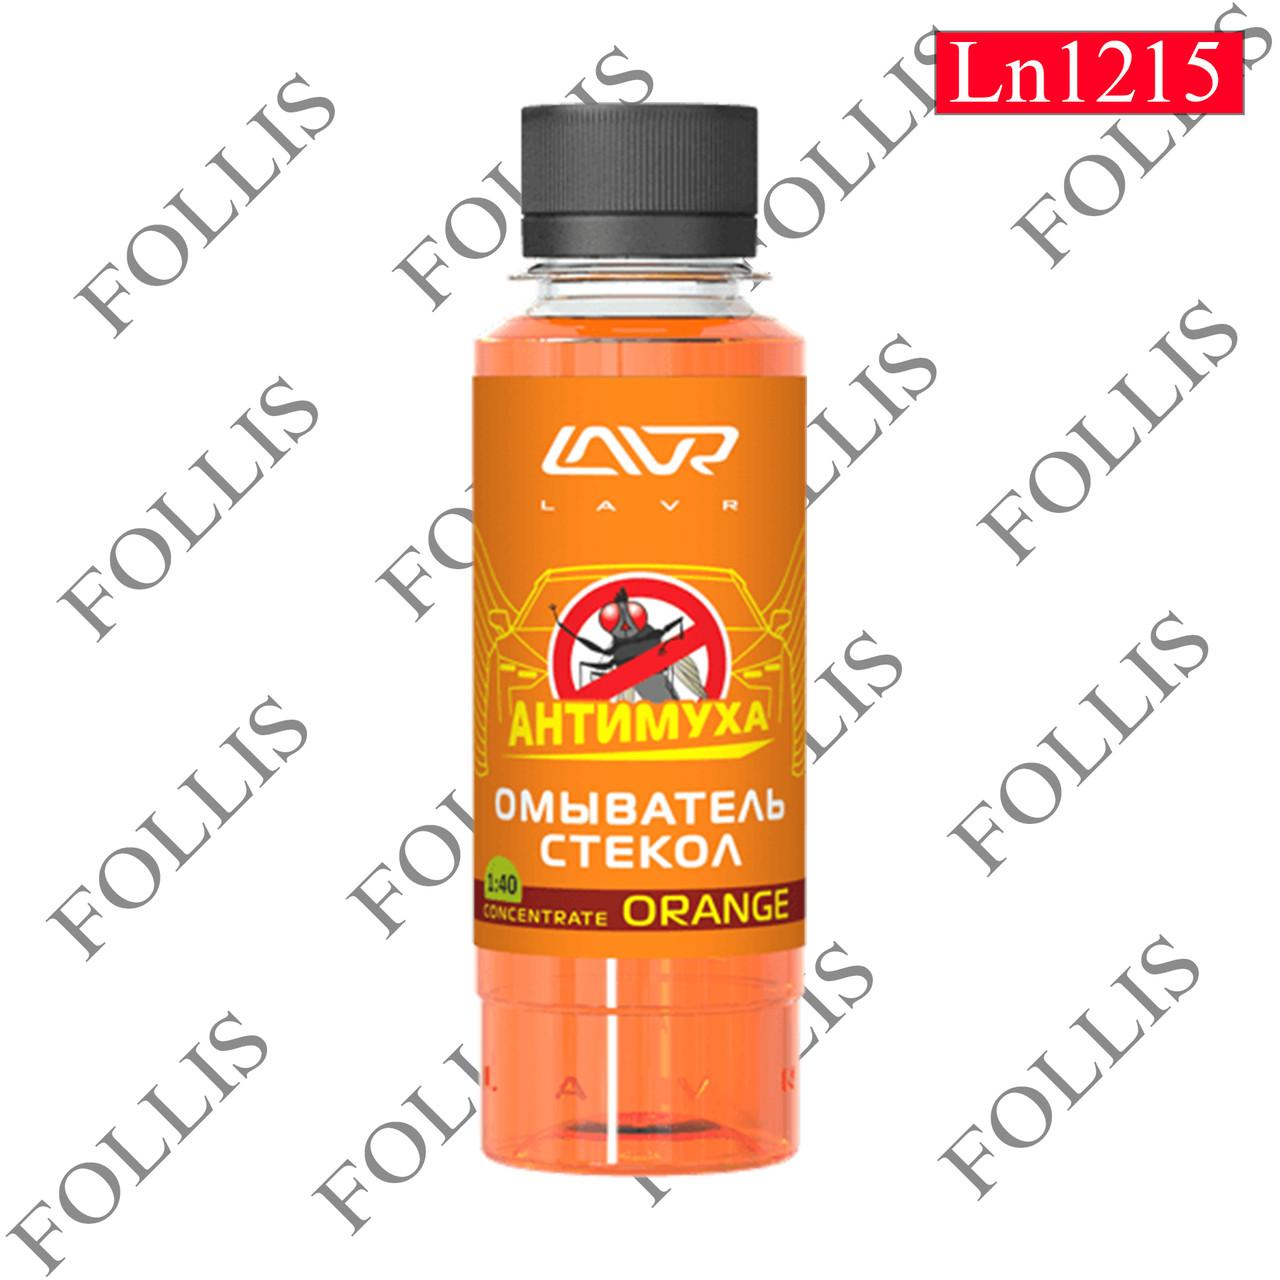 Омыватель стекол Orange Анти Муха концентрат LAVR Glass Washer Concentrate Anti Fly 120мл (9шт. в шо